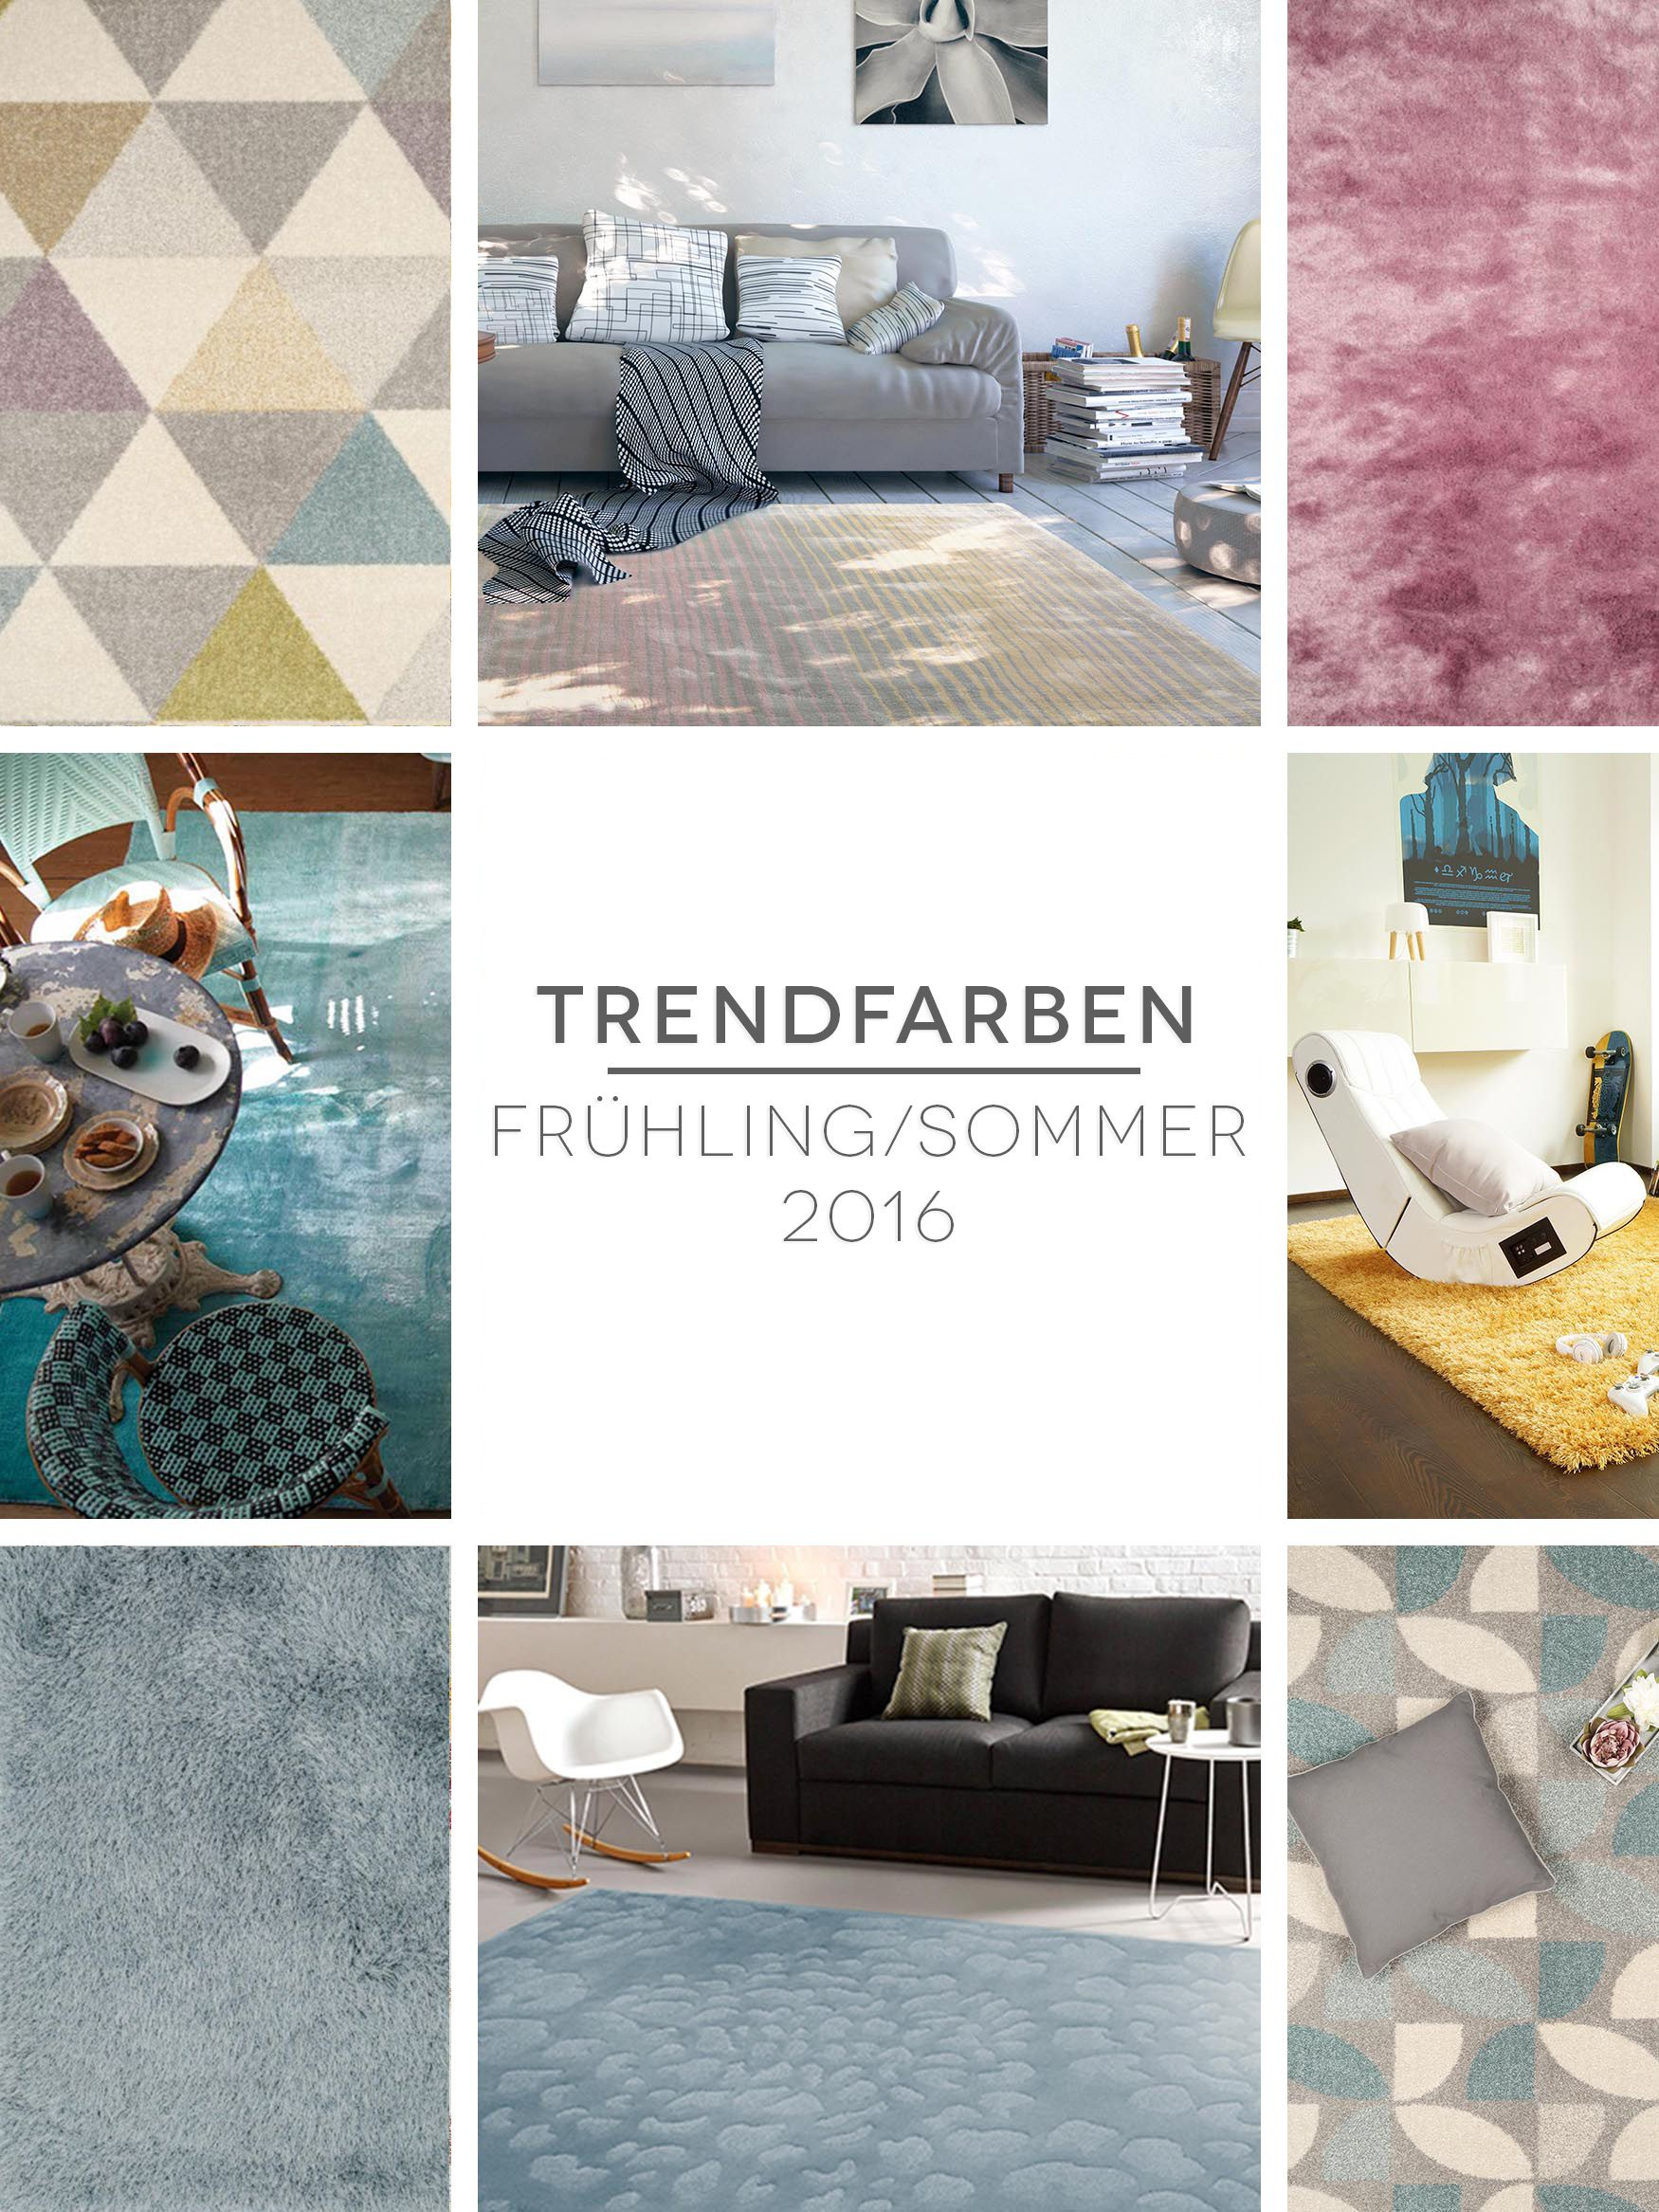 Trendfarben Frühling Sommer 2016: Mode & Einrichtung